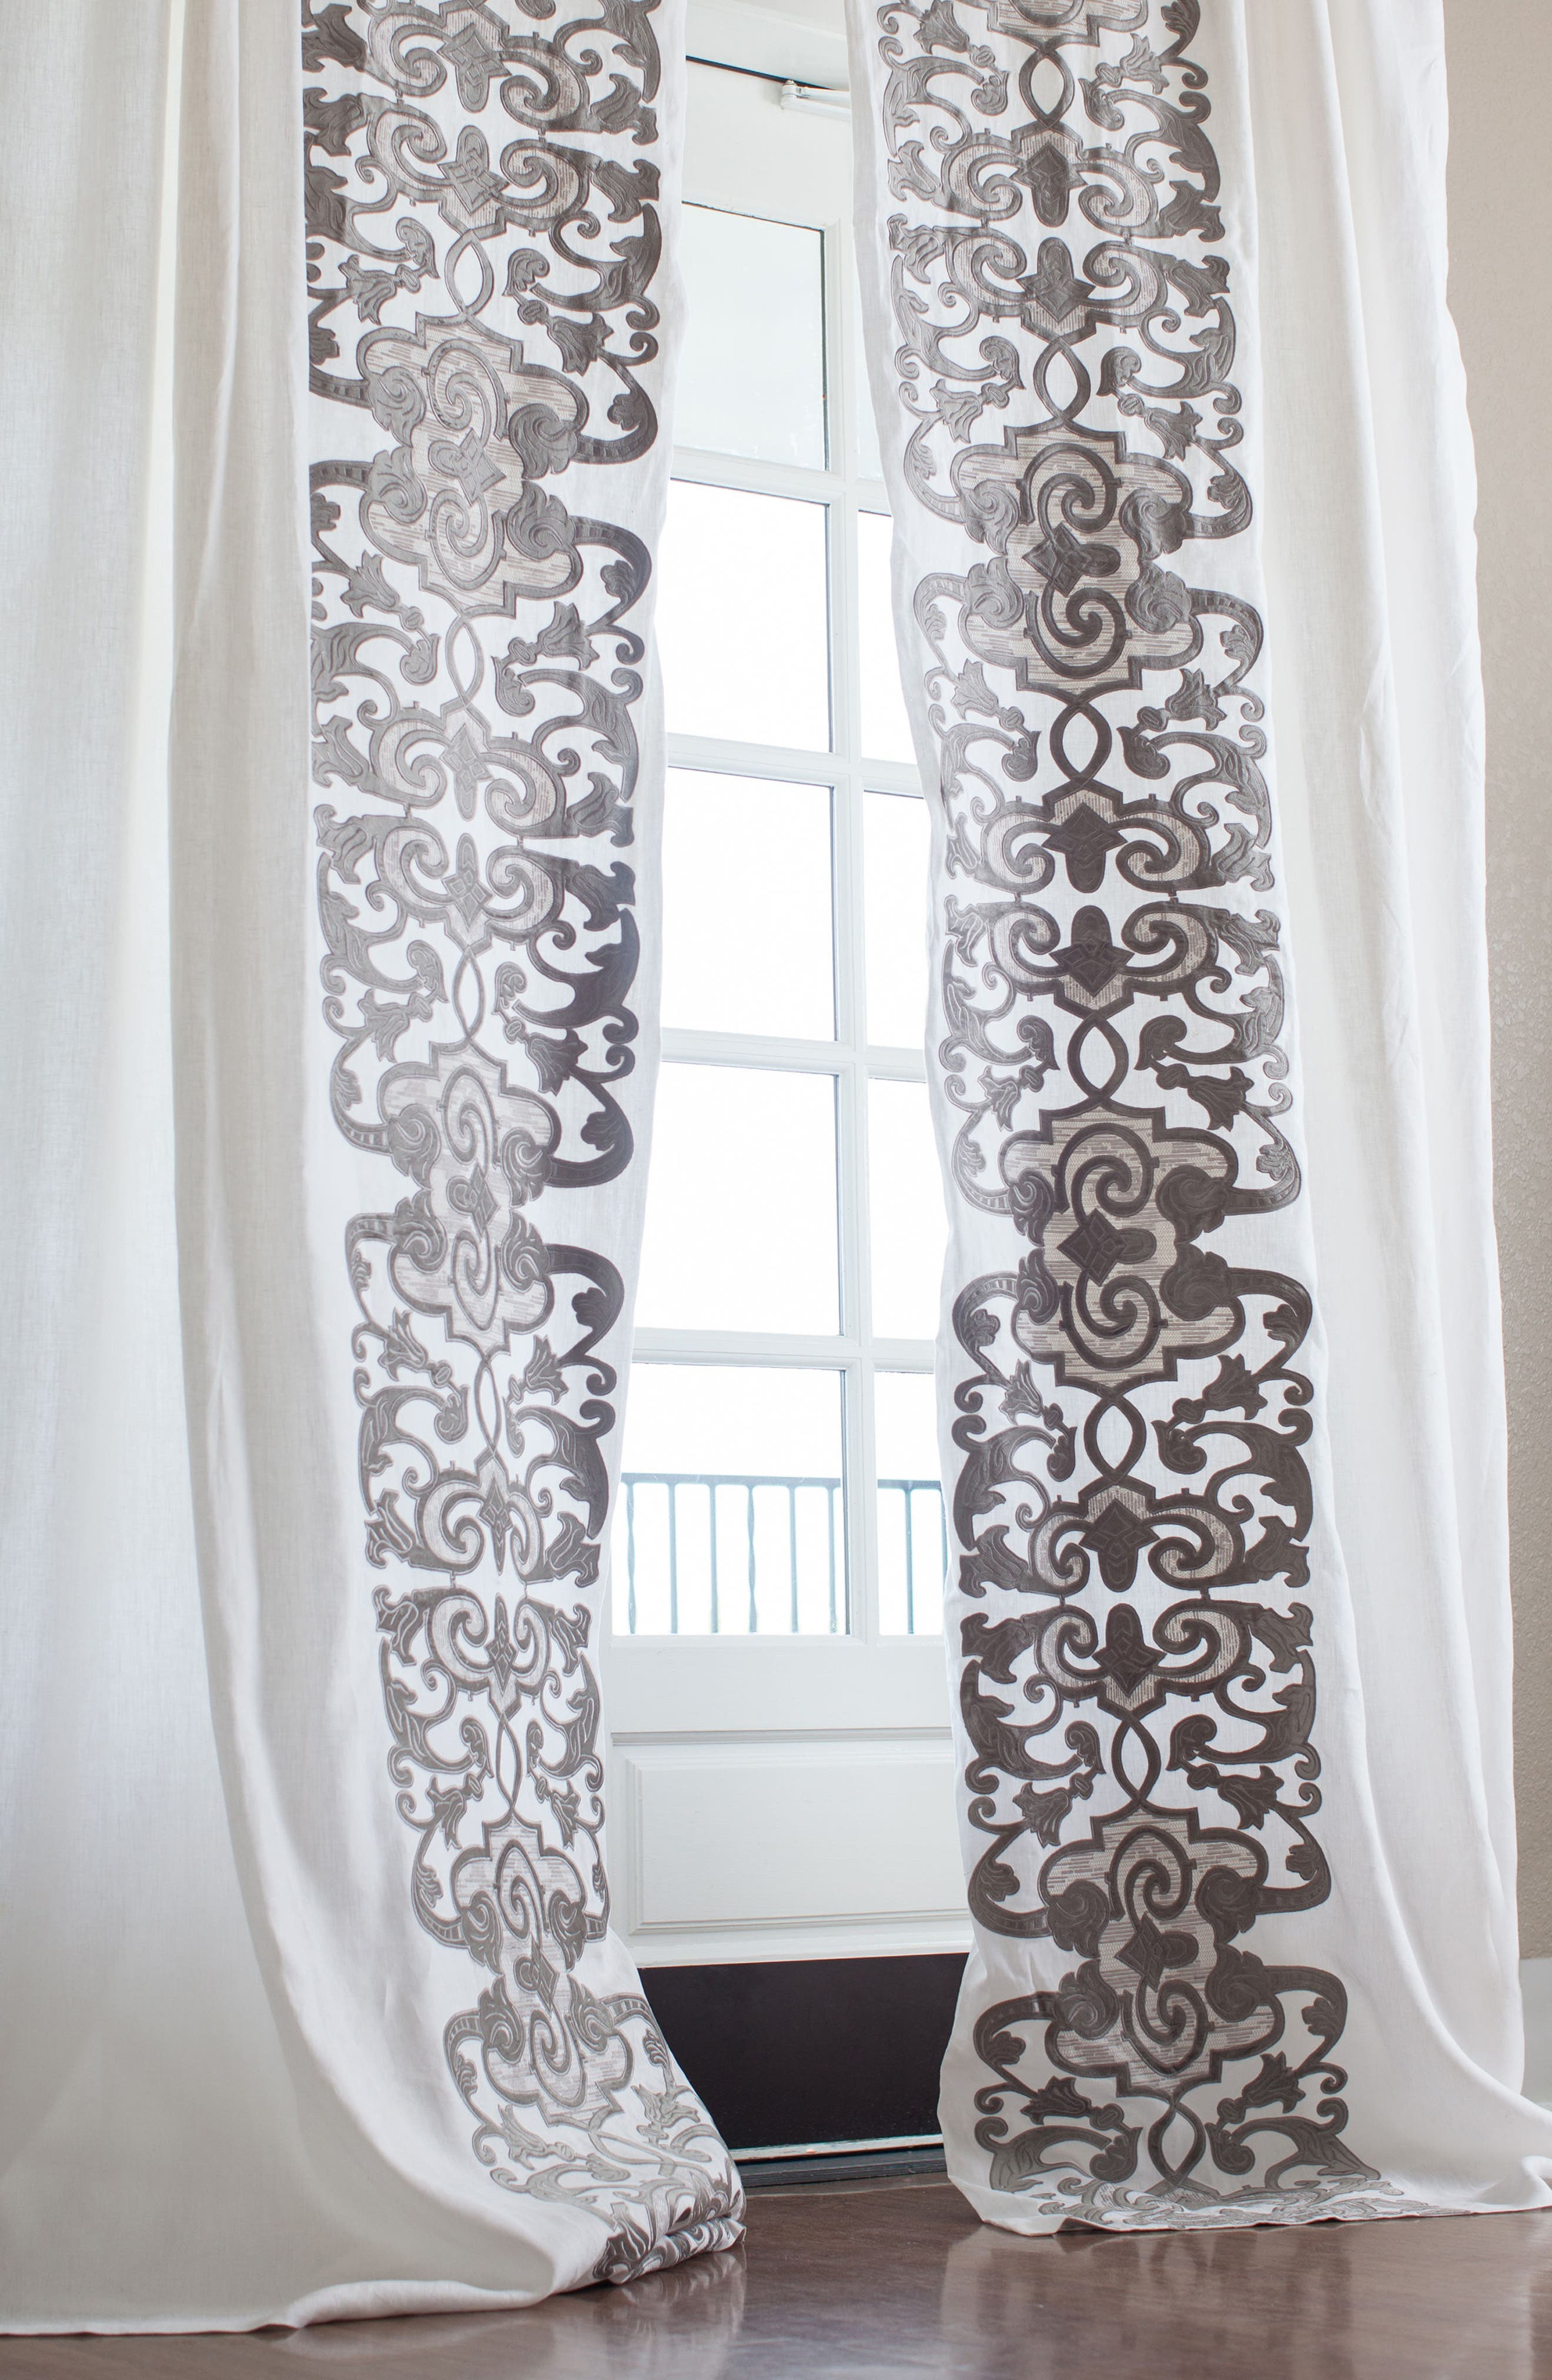 Mozart Window Panels,                             Main thumbnail 1, color,                             WHITE SILVER